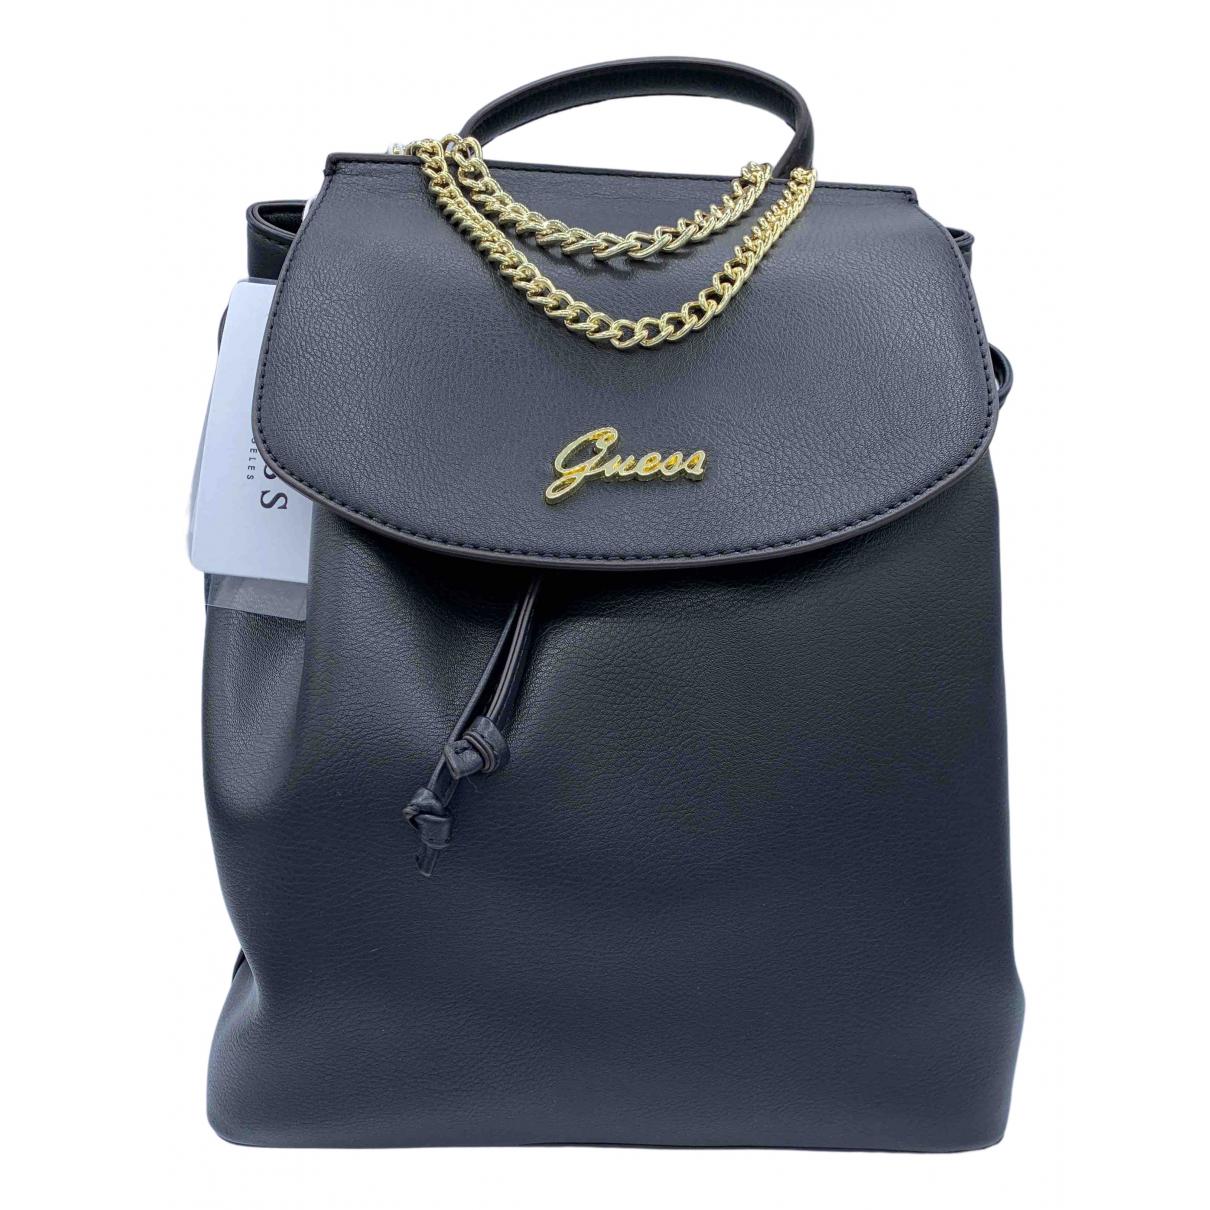 Guess \N Black handbag for Women \N